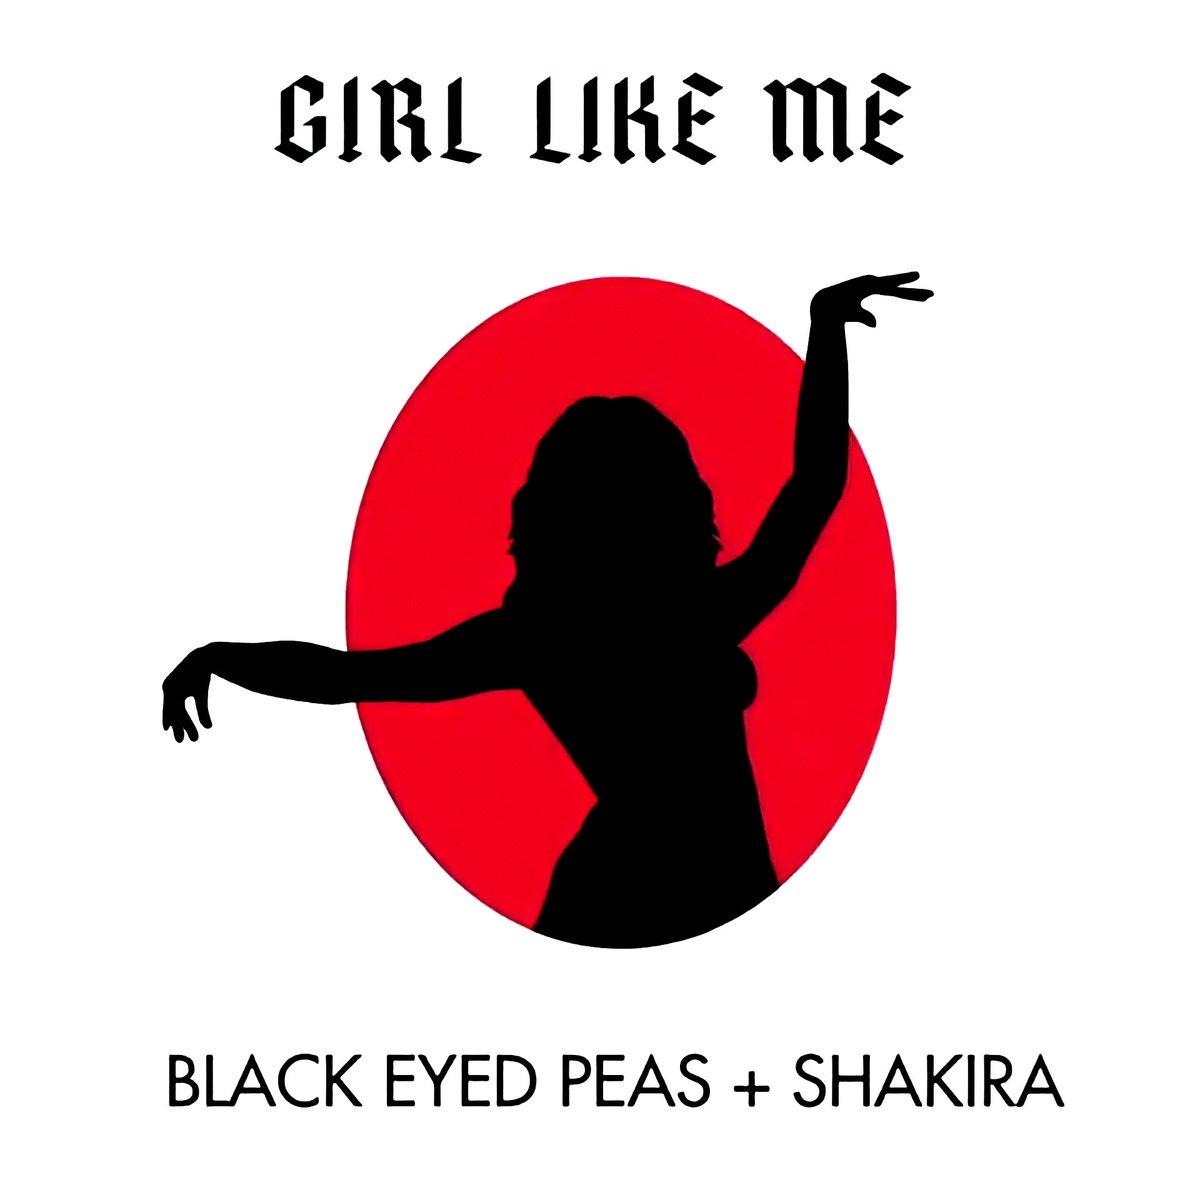 GIRL LIKE ME debuta en la lista oficial de Países Bajos. #57 (NEW) - DUTCH SINGLE TOP 100 🇳🇱  *La semana pasada fue #9 en el Singles Tip (Bubbling Under).  @ShakOnChart @WWSHAK @LorenzoShak_ @TheSheWolfPack @WorldShakifans @ShakiraMedia @shakira #GirlLikeMe